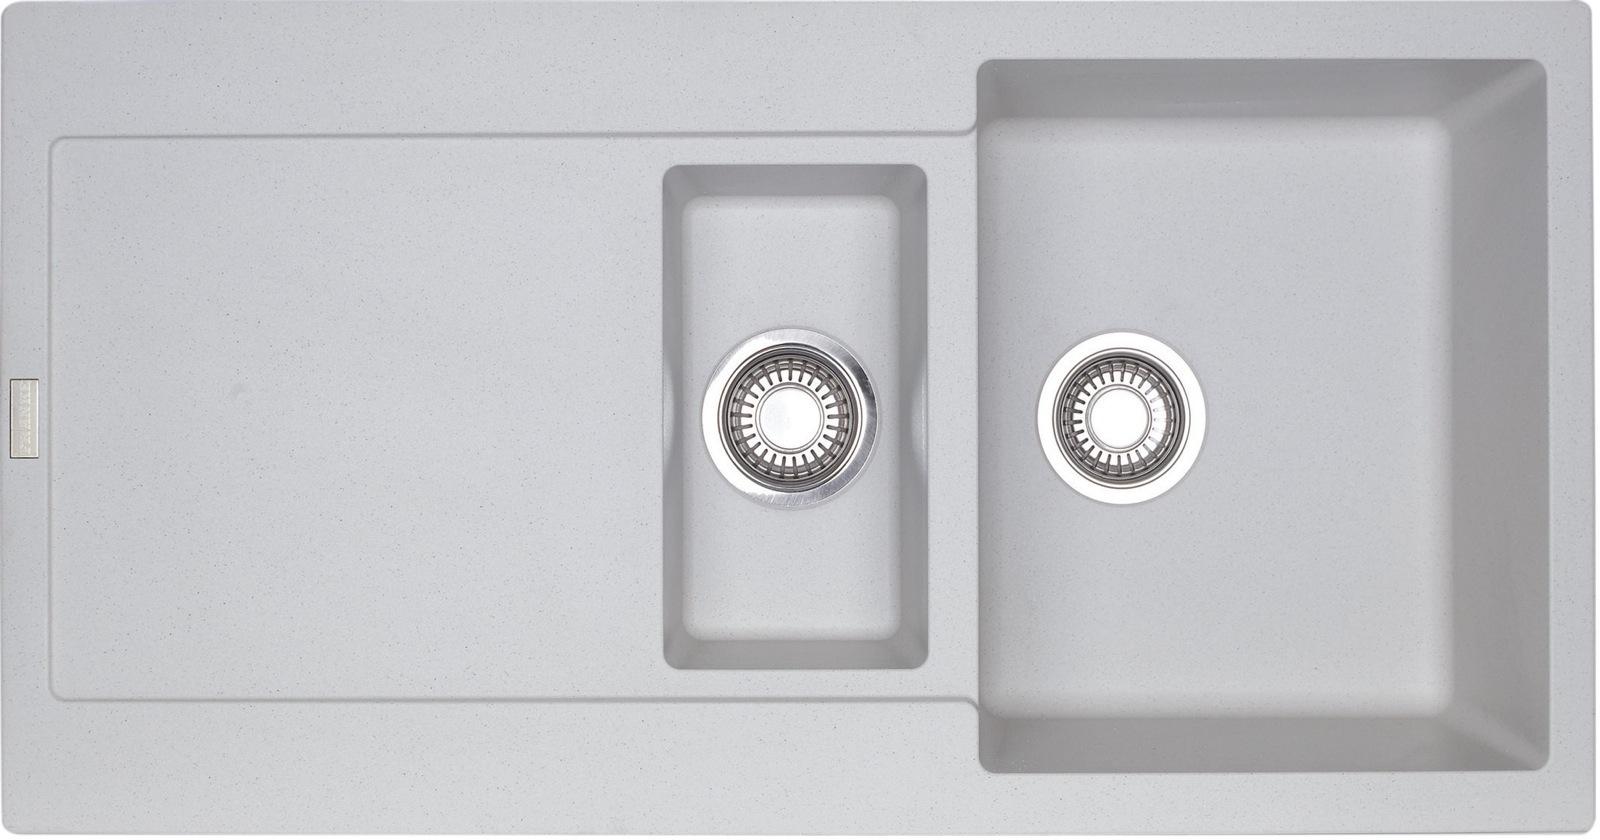 Chiuveta bucatarie fragranite Franke Maris MRG 651 reversibila 970x500mm tehnologie Sanitized Bianco imagine sensodays.ro